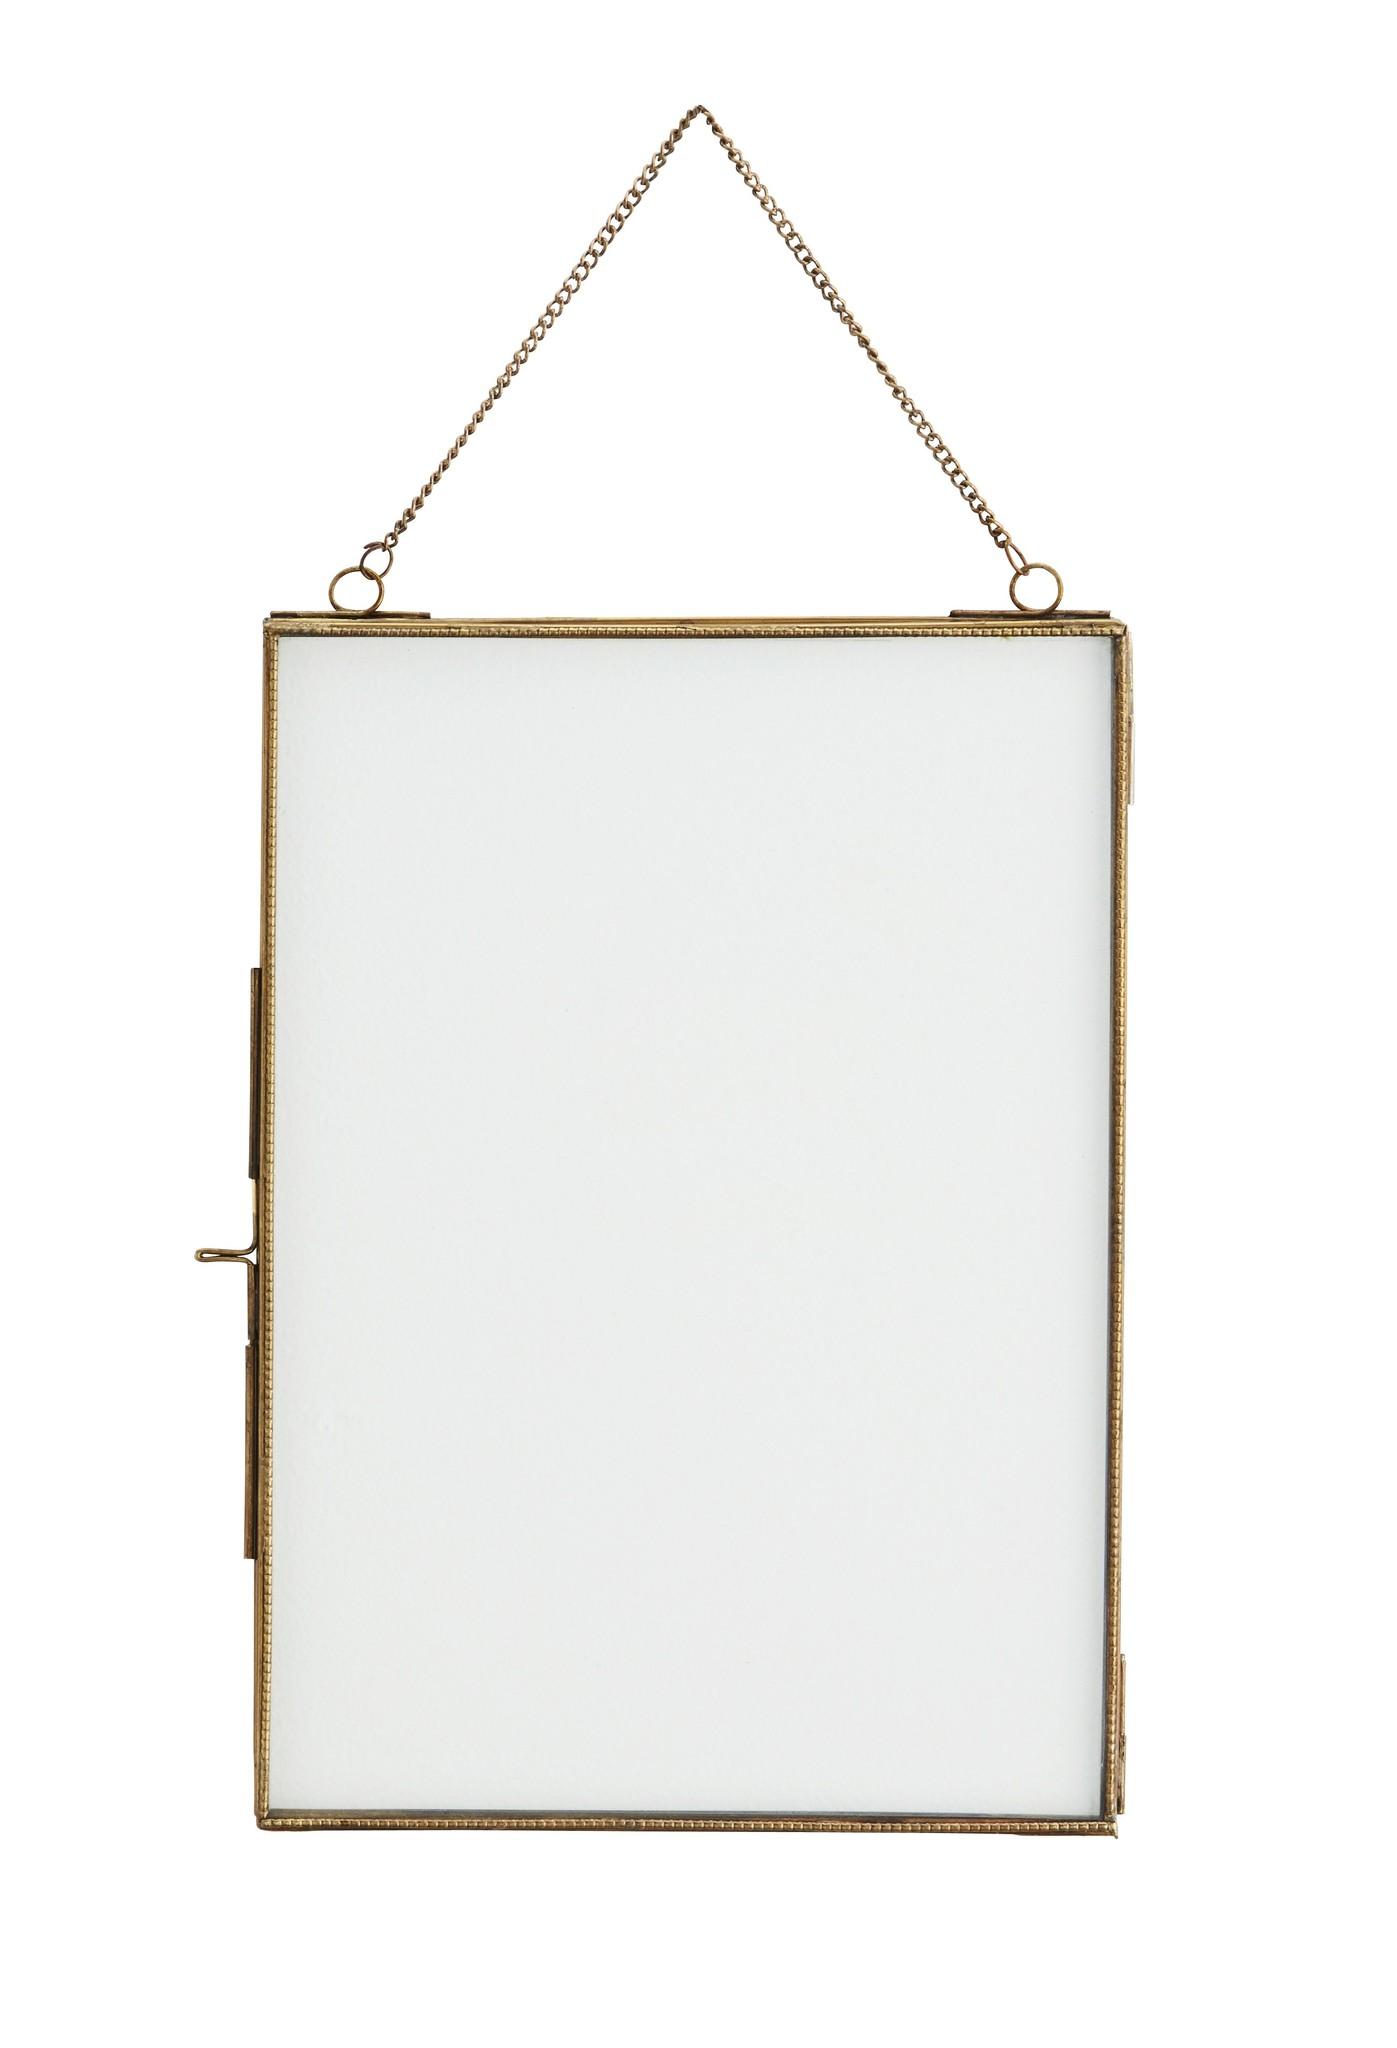 Madam Stoltz photo frame, 21x29,5, gold